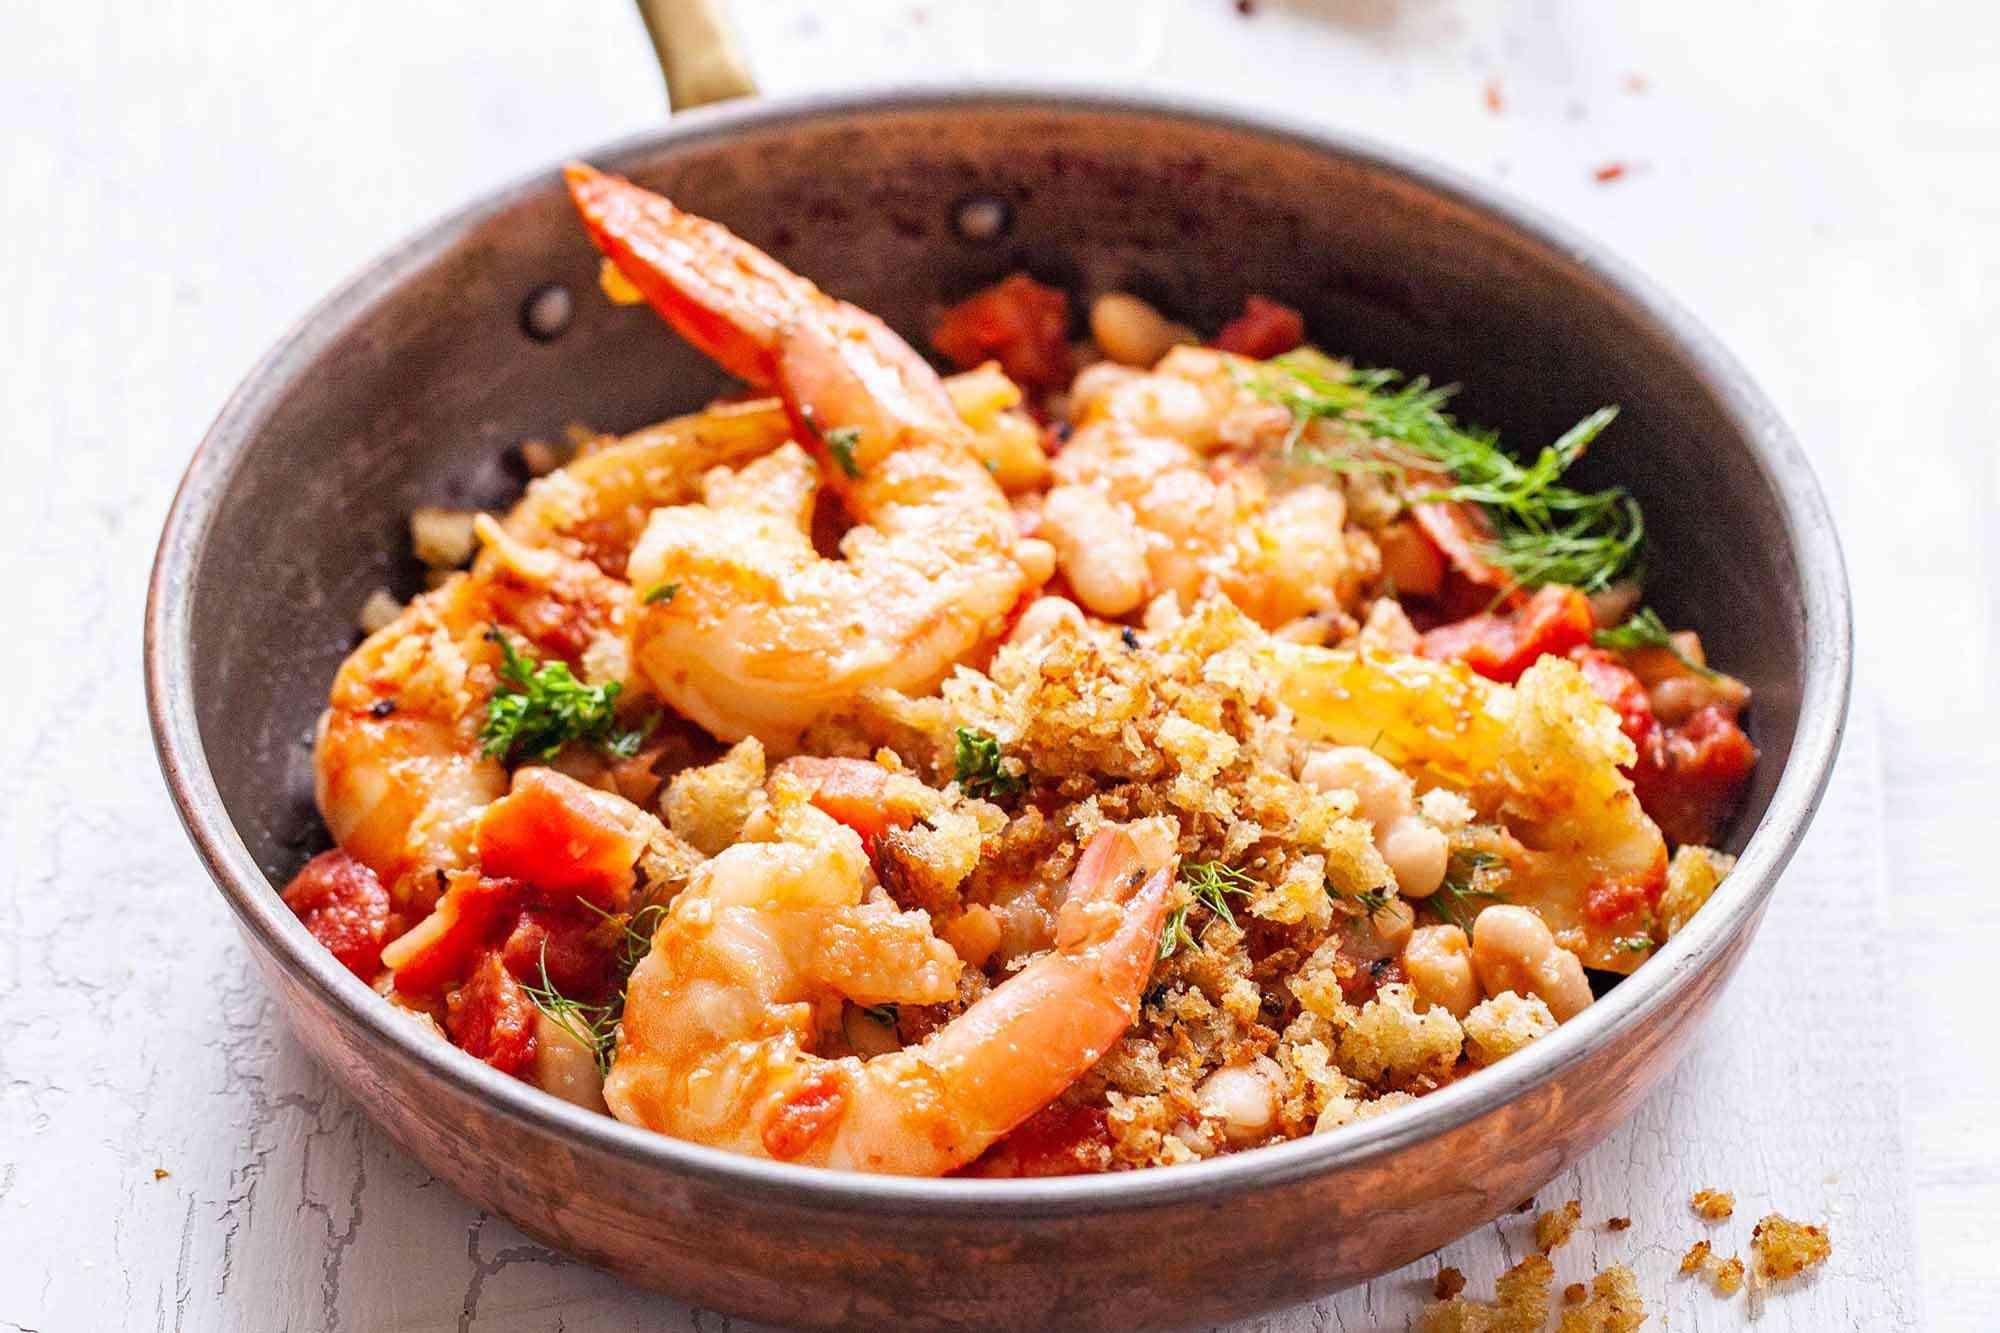 Mediterranean Shrimp Skillet Dinner - shrimp, breadcrumbs, vegetables, tomatoes and beans in skillet